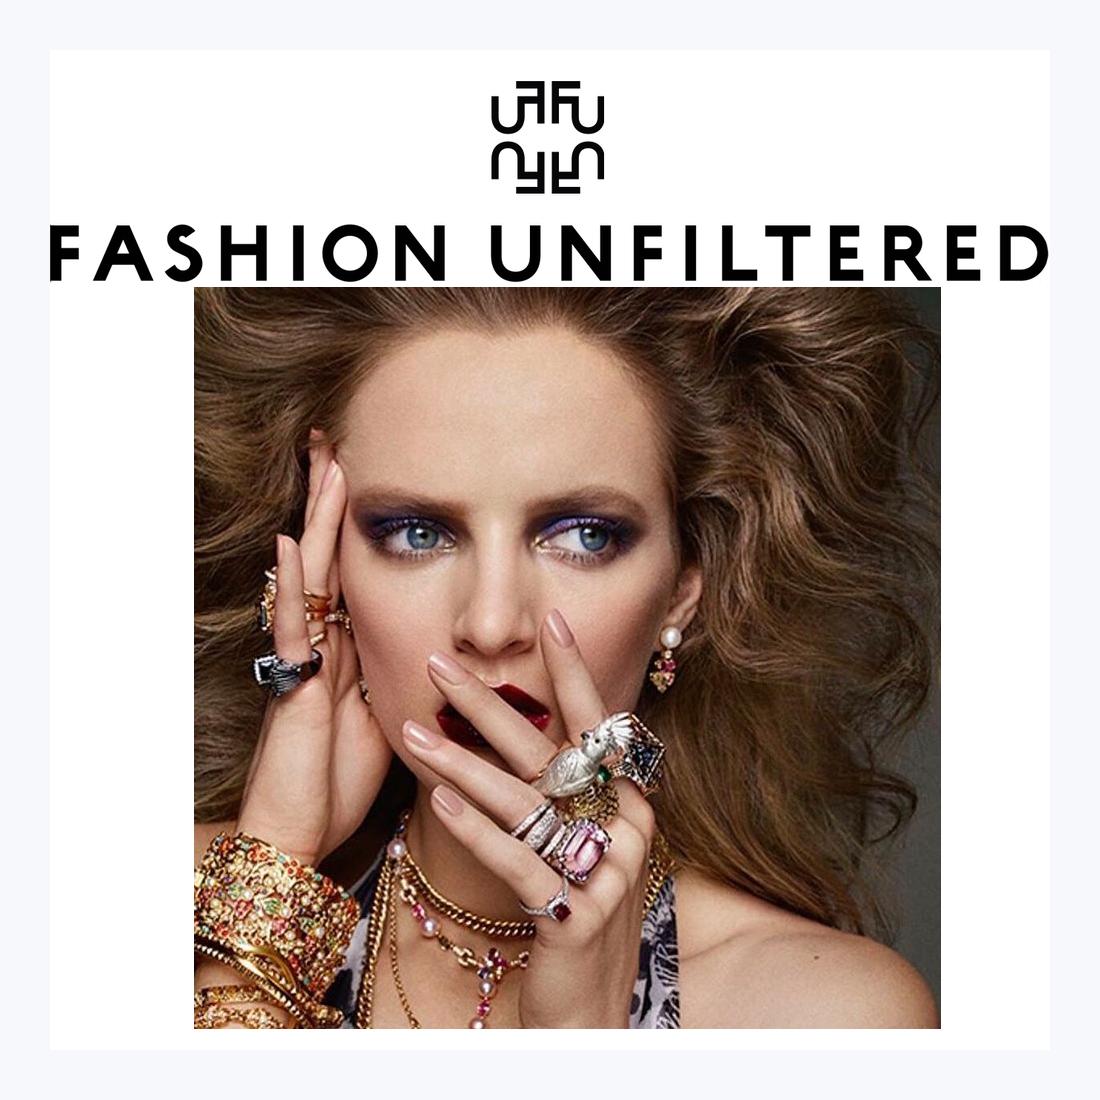 Fashion Unfiltered Photo.jpg